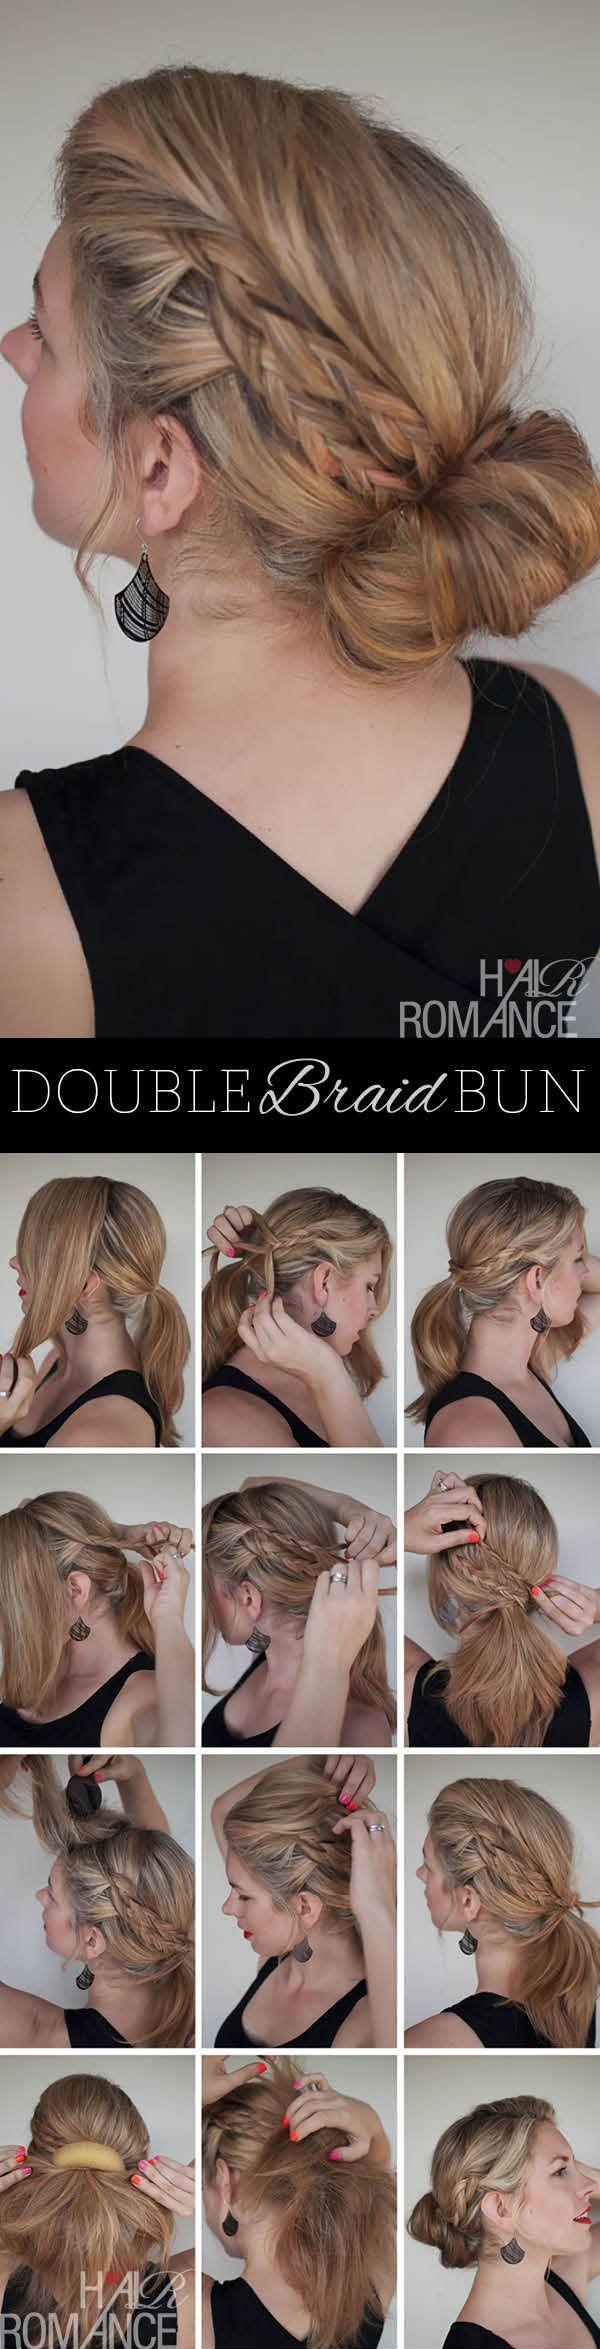 This is pretty: the double-braid bun....